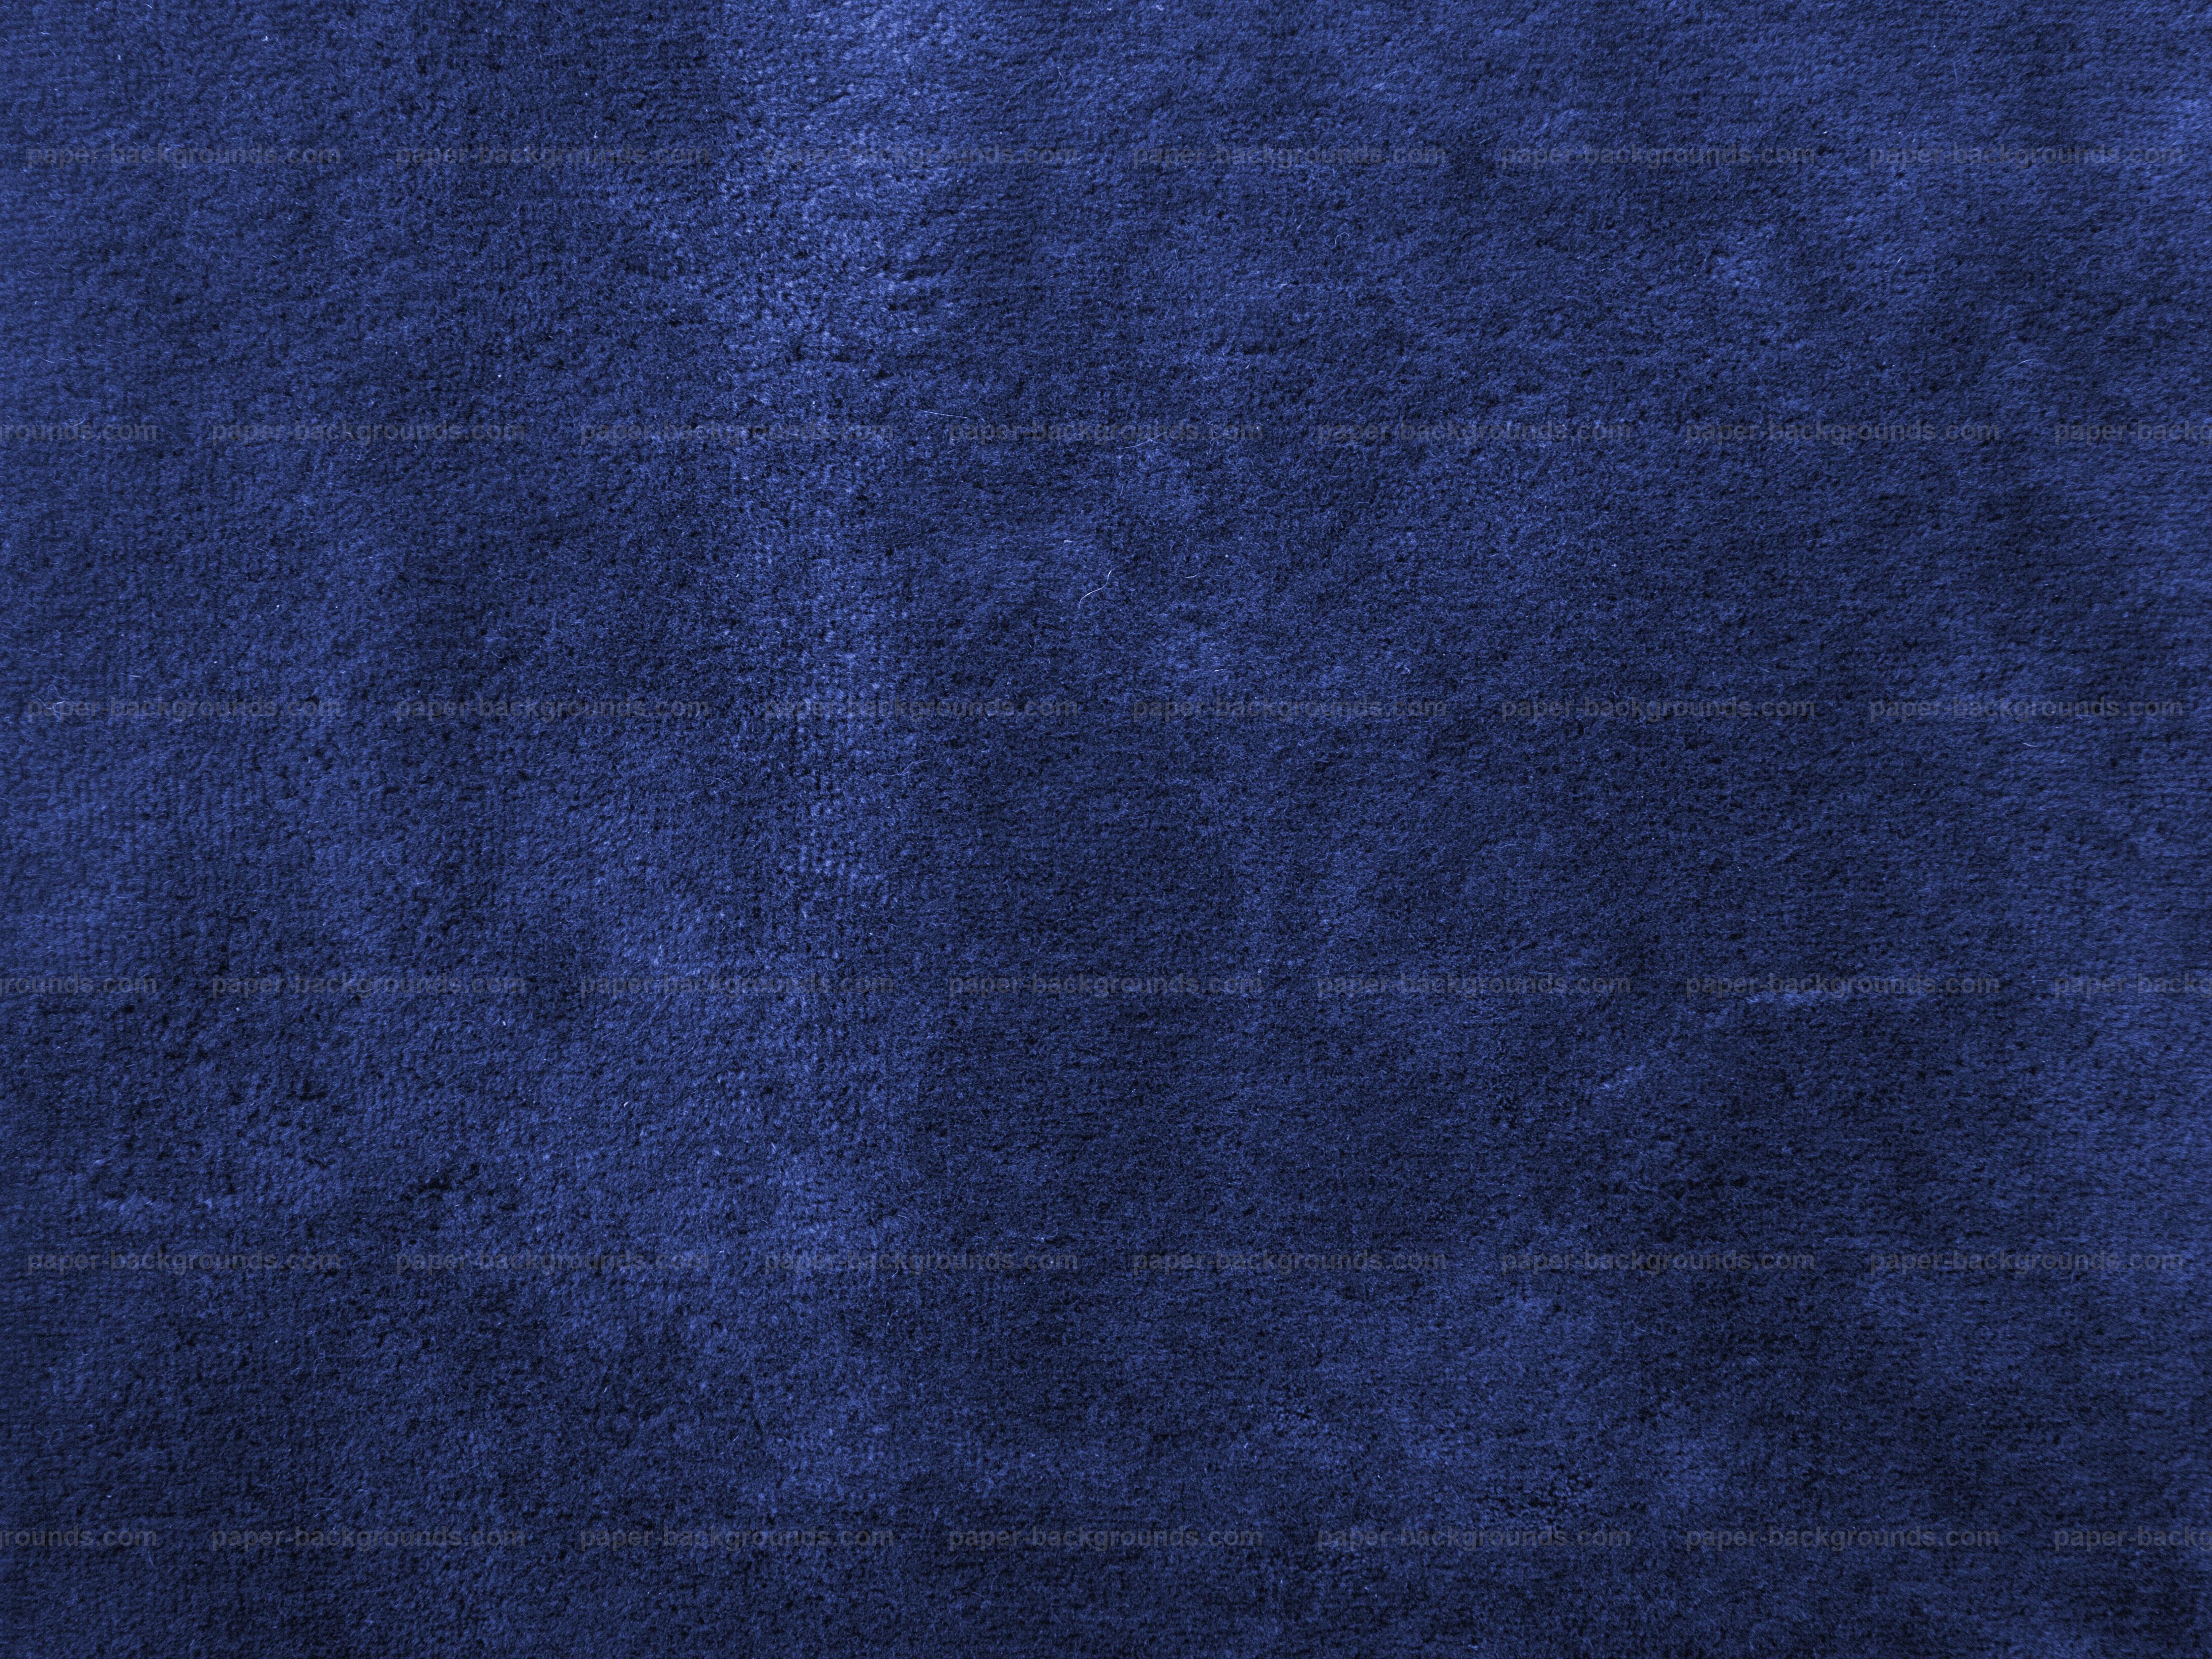 Blue Velvet Texture Background High Resolution 4352 x 3264 pixels 4352x3264